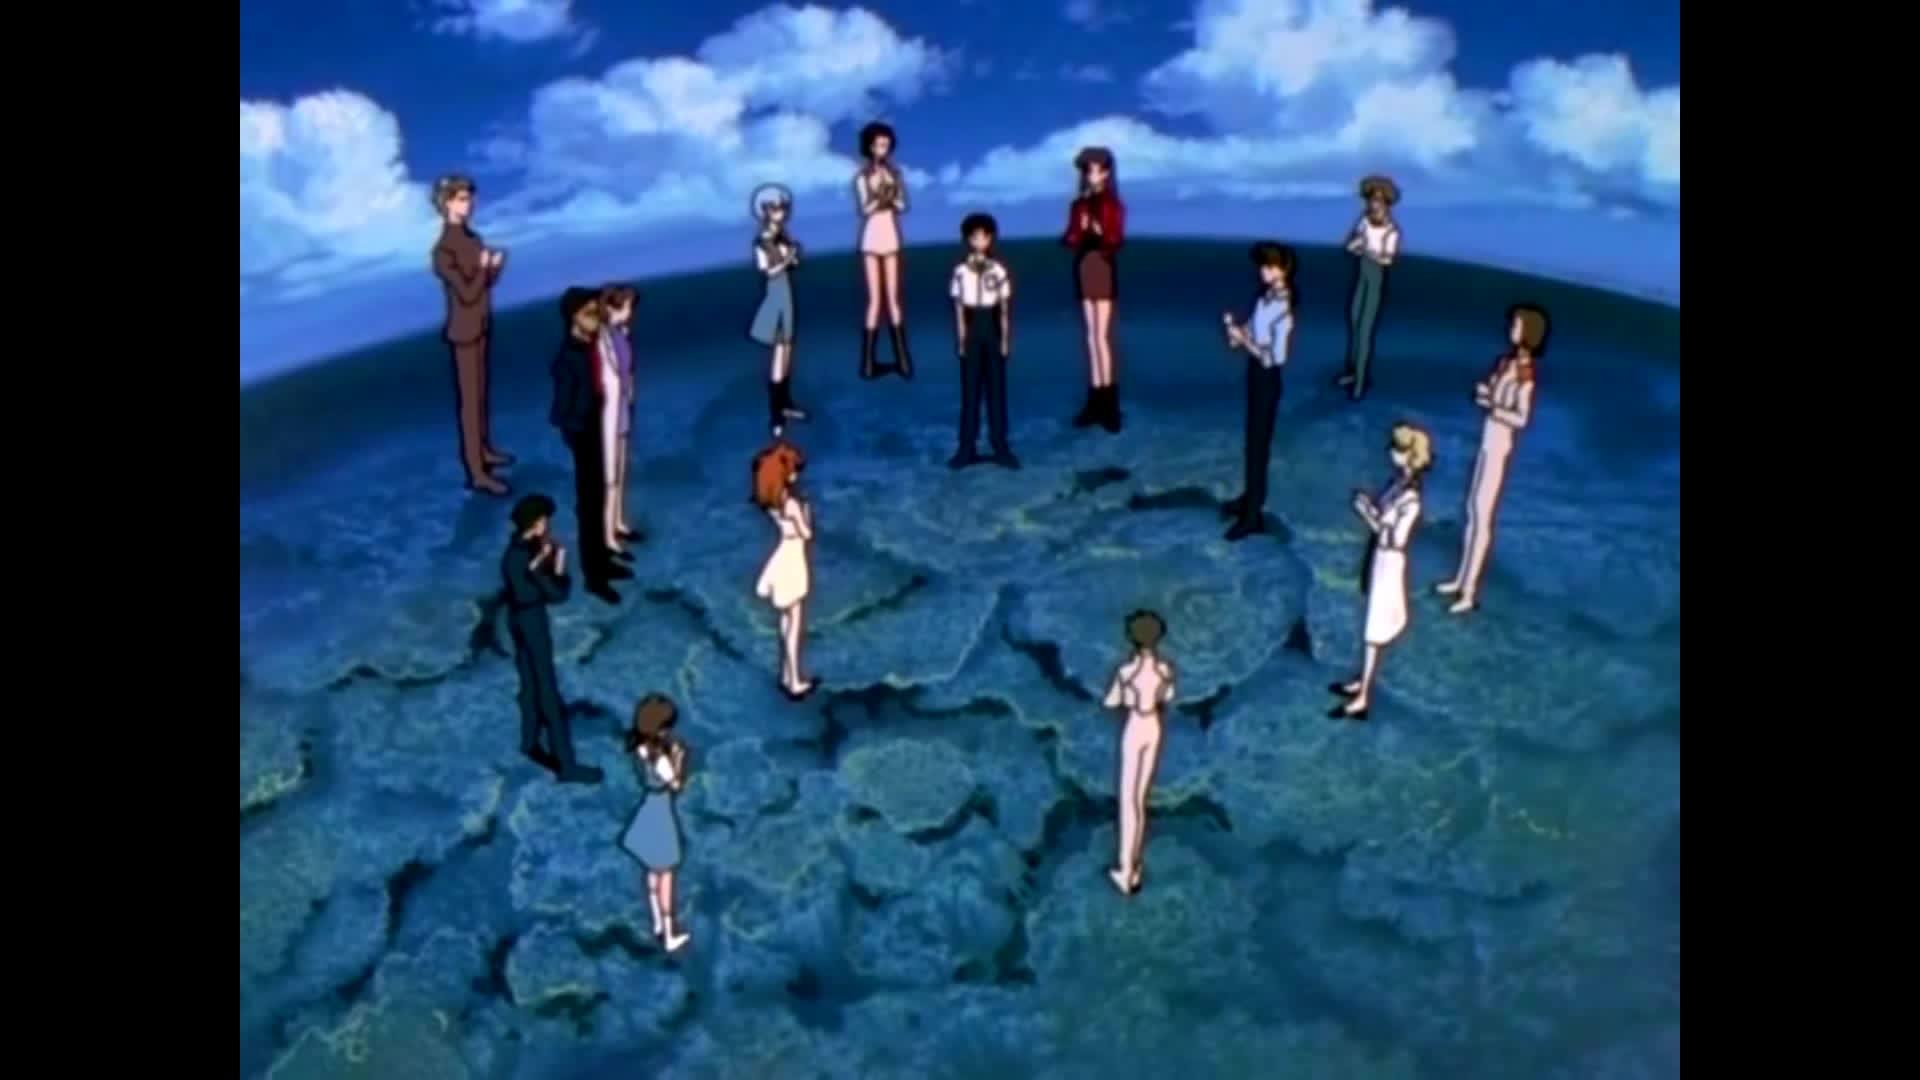 DotA2, animated cartoon (tv genre), neon genesis evangelion (adapted work), Evangelion Congratulations GIFs